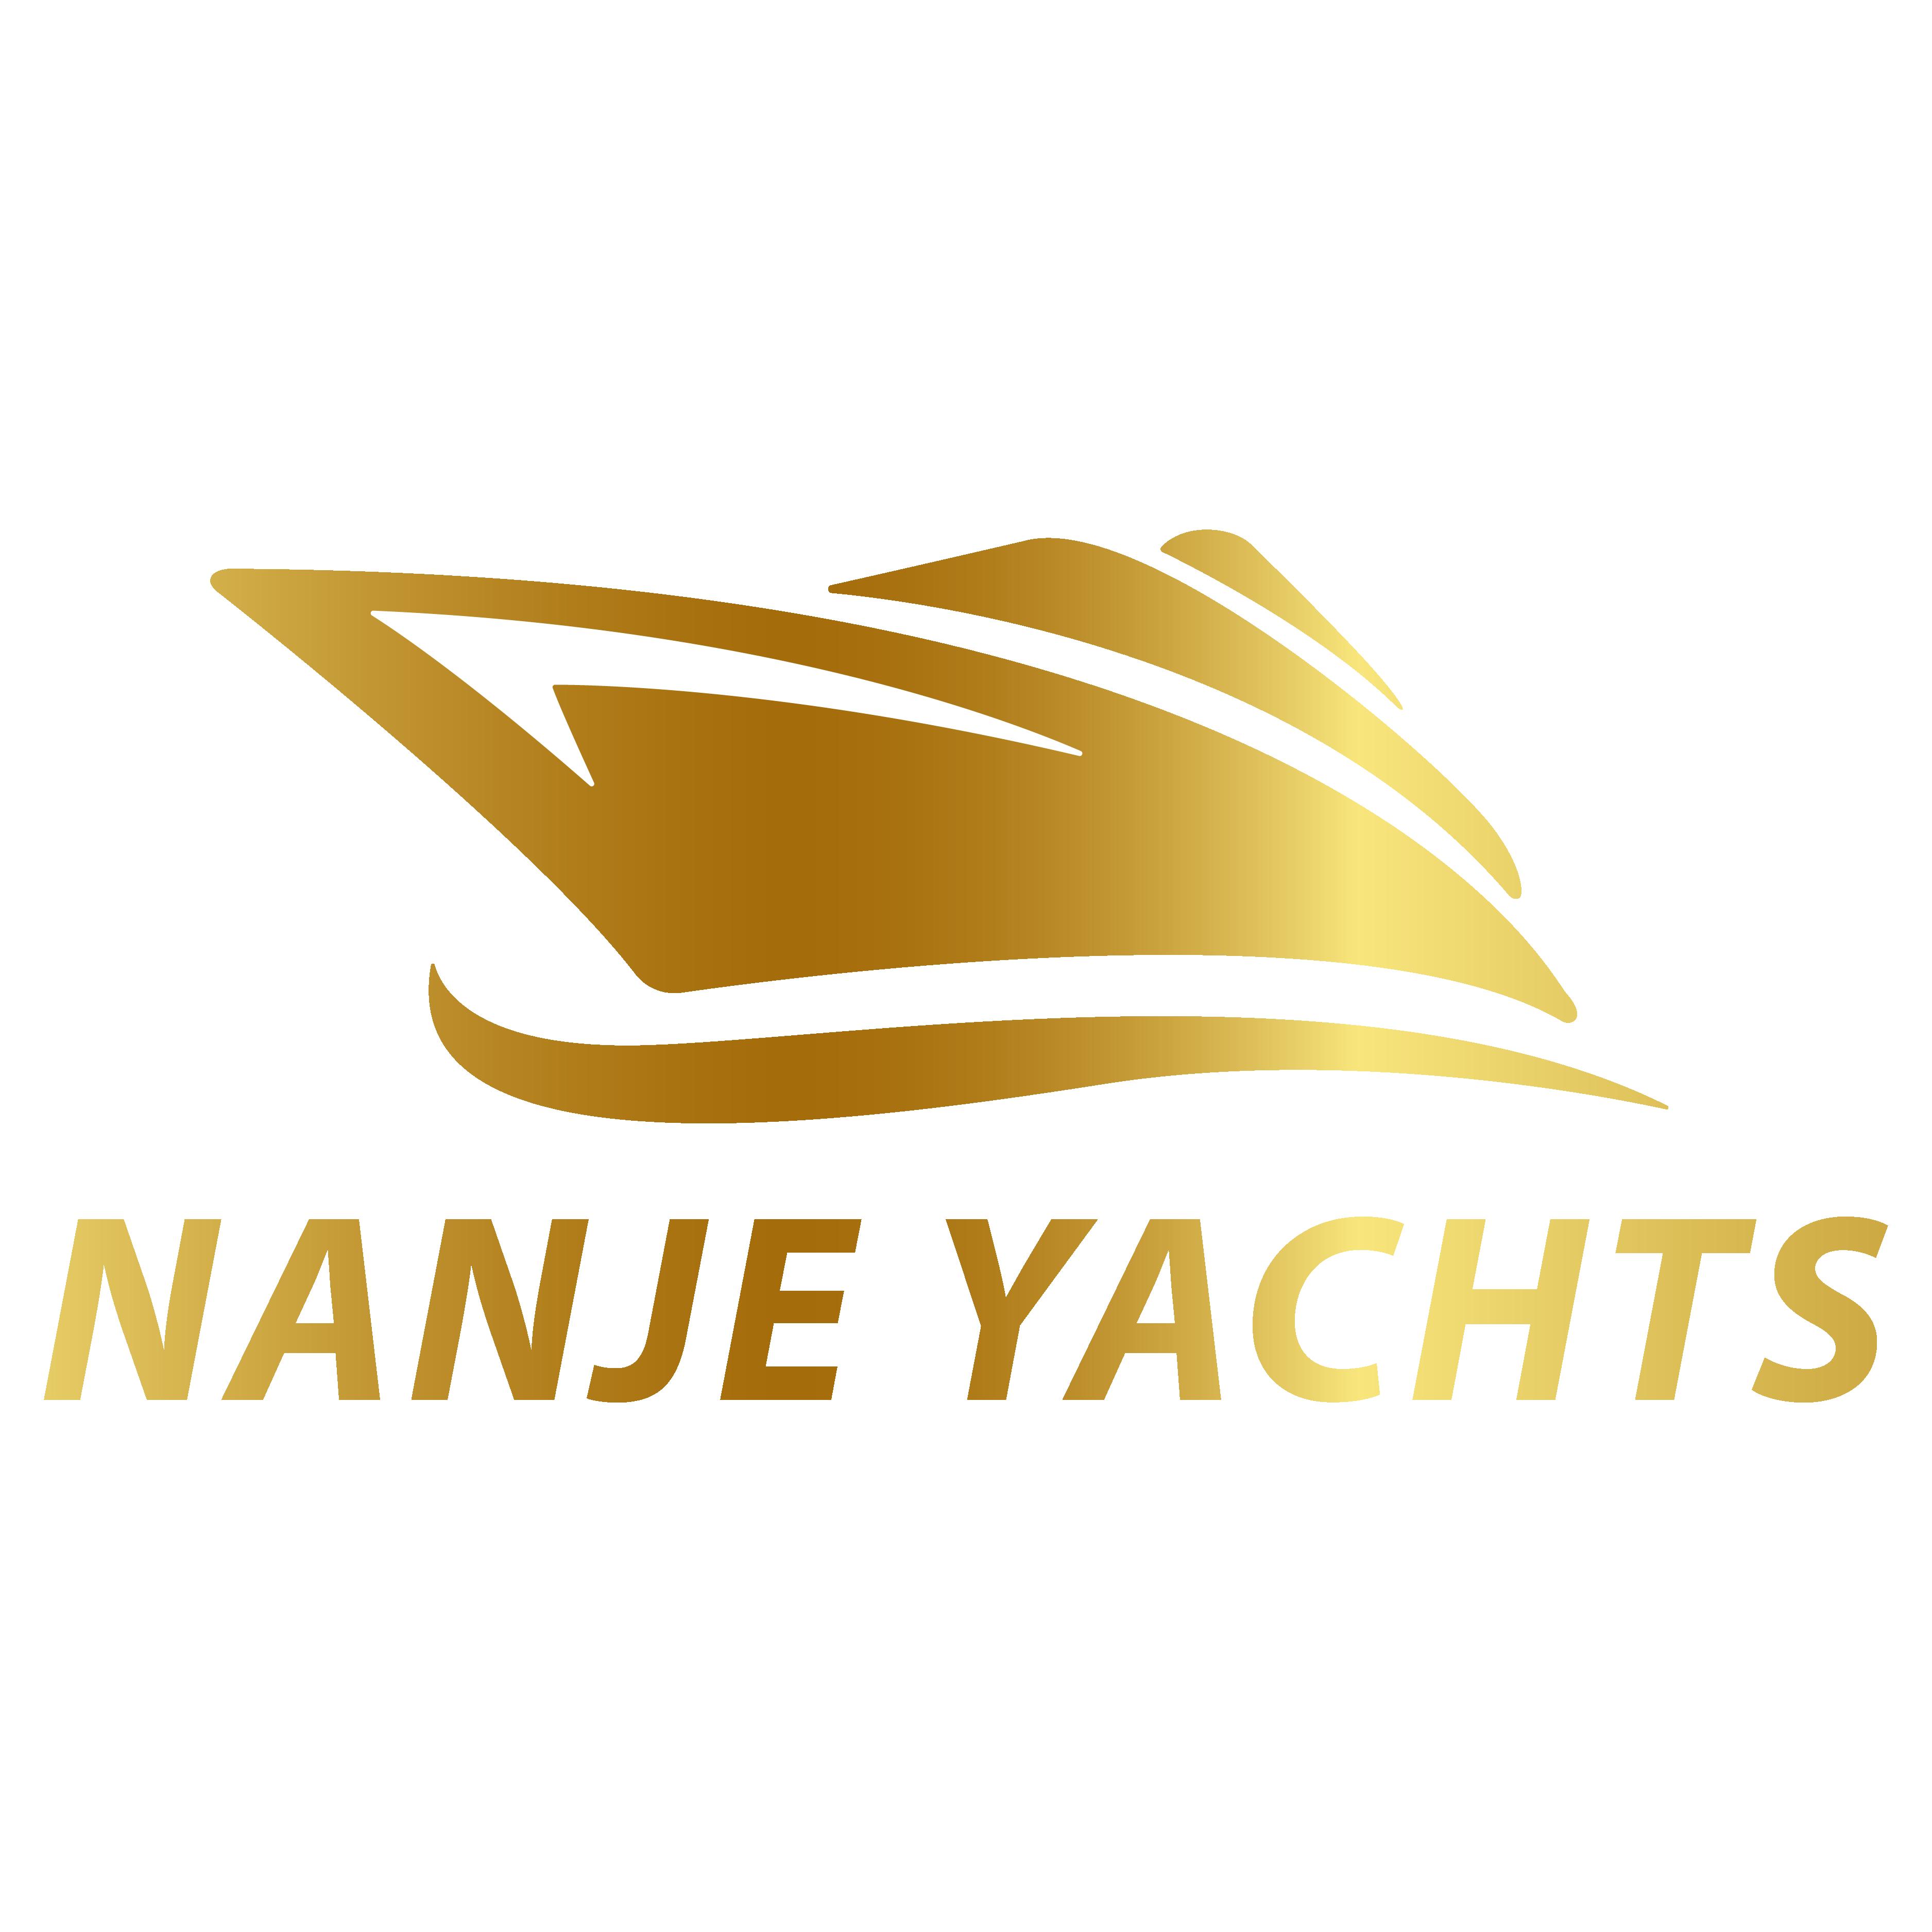 Rental Yacht Dubai